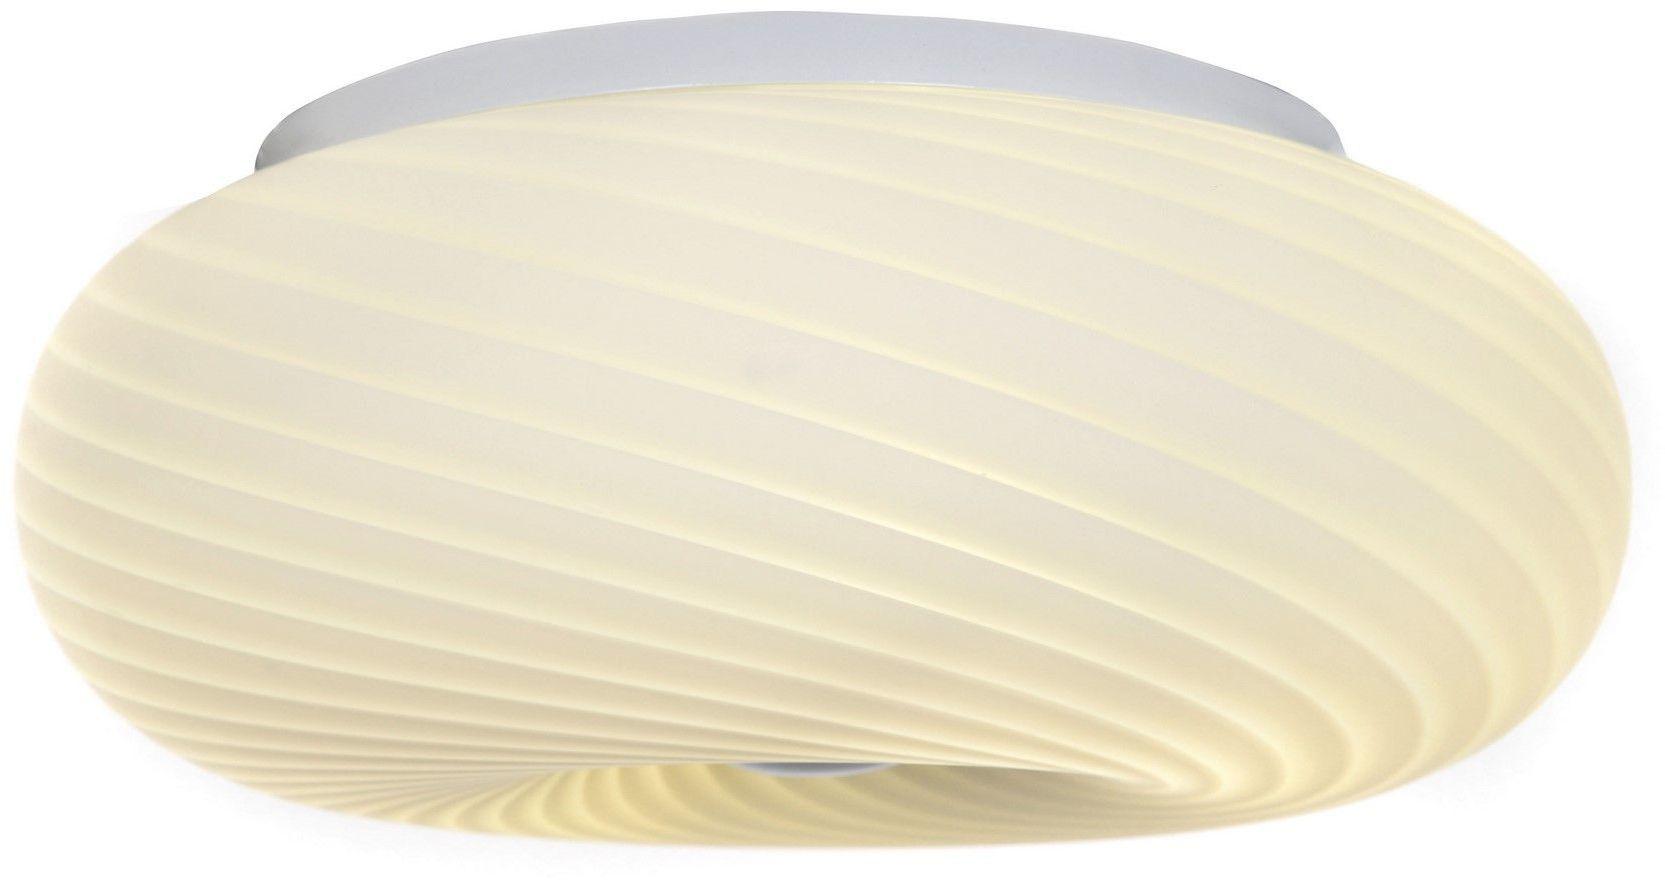 NOWOCZESNA LAMPA SUFITOWA PLAFON MONARTE D28